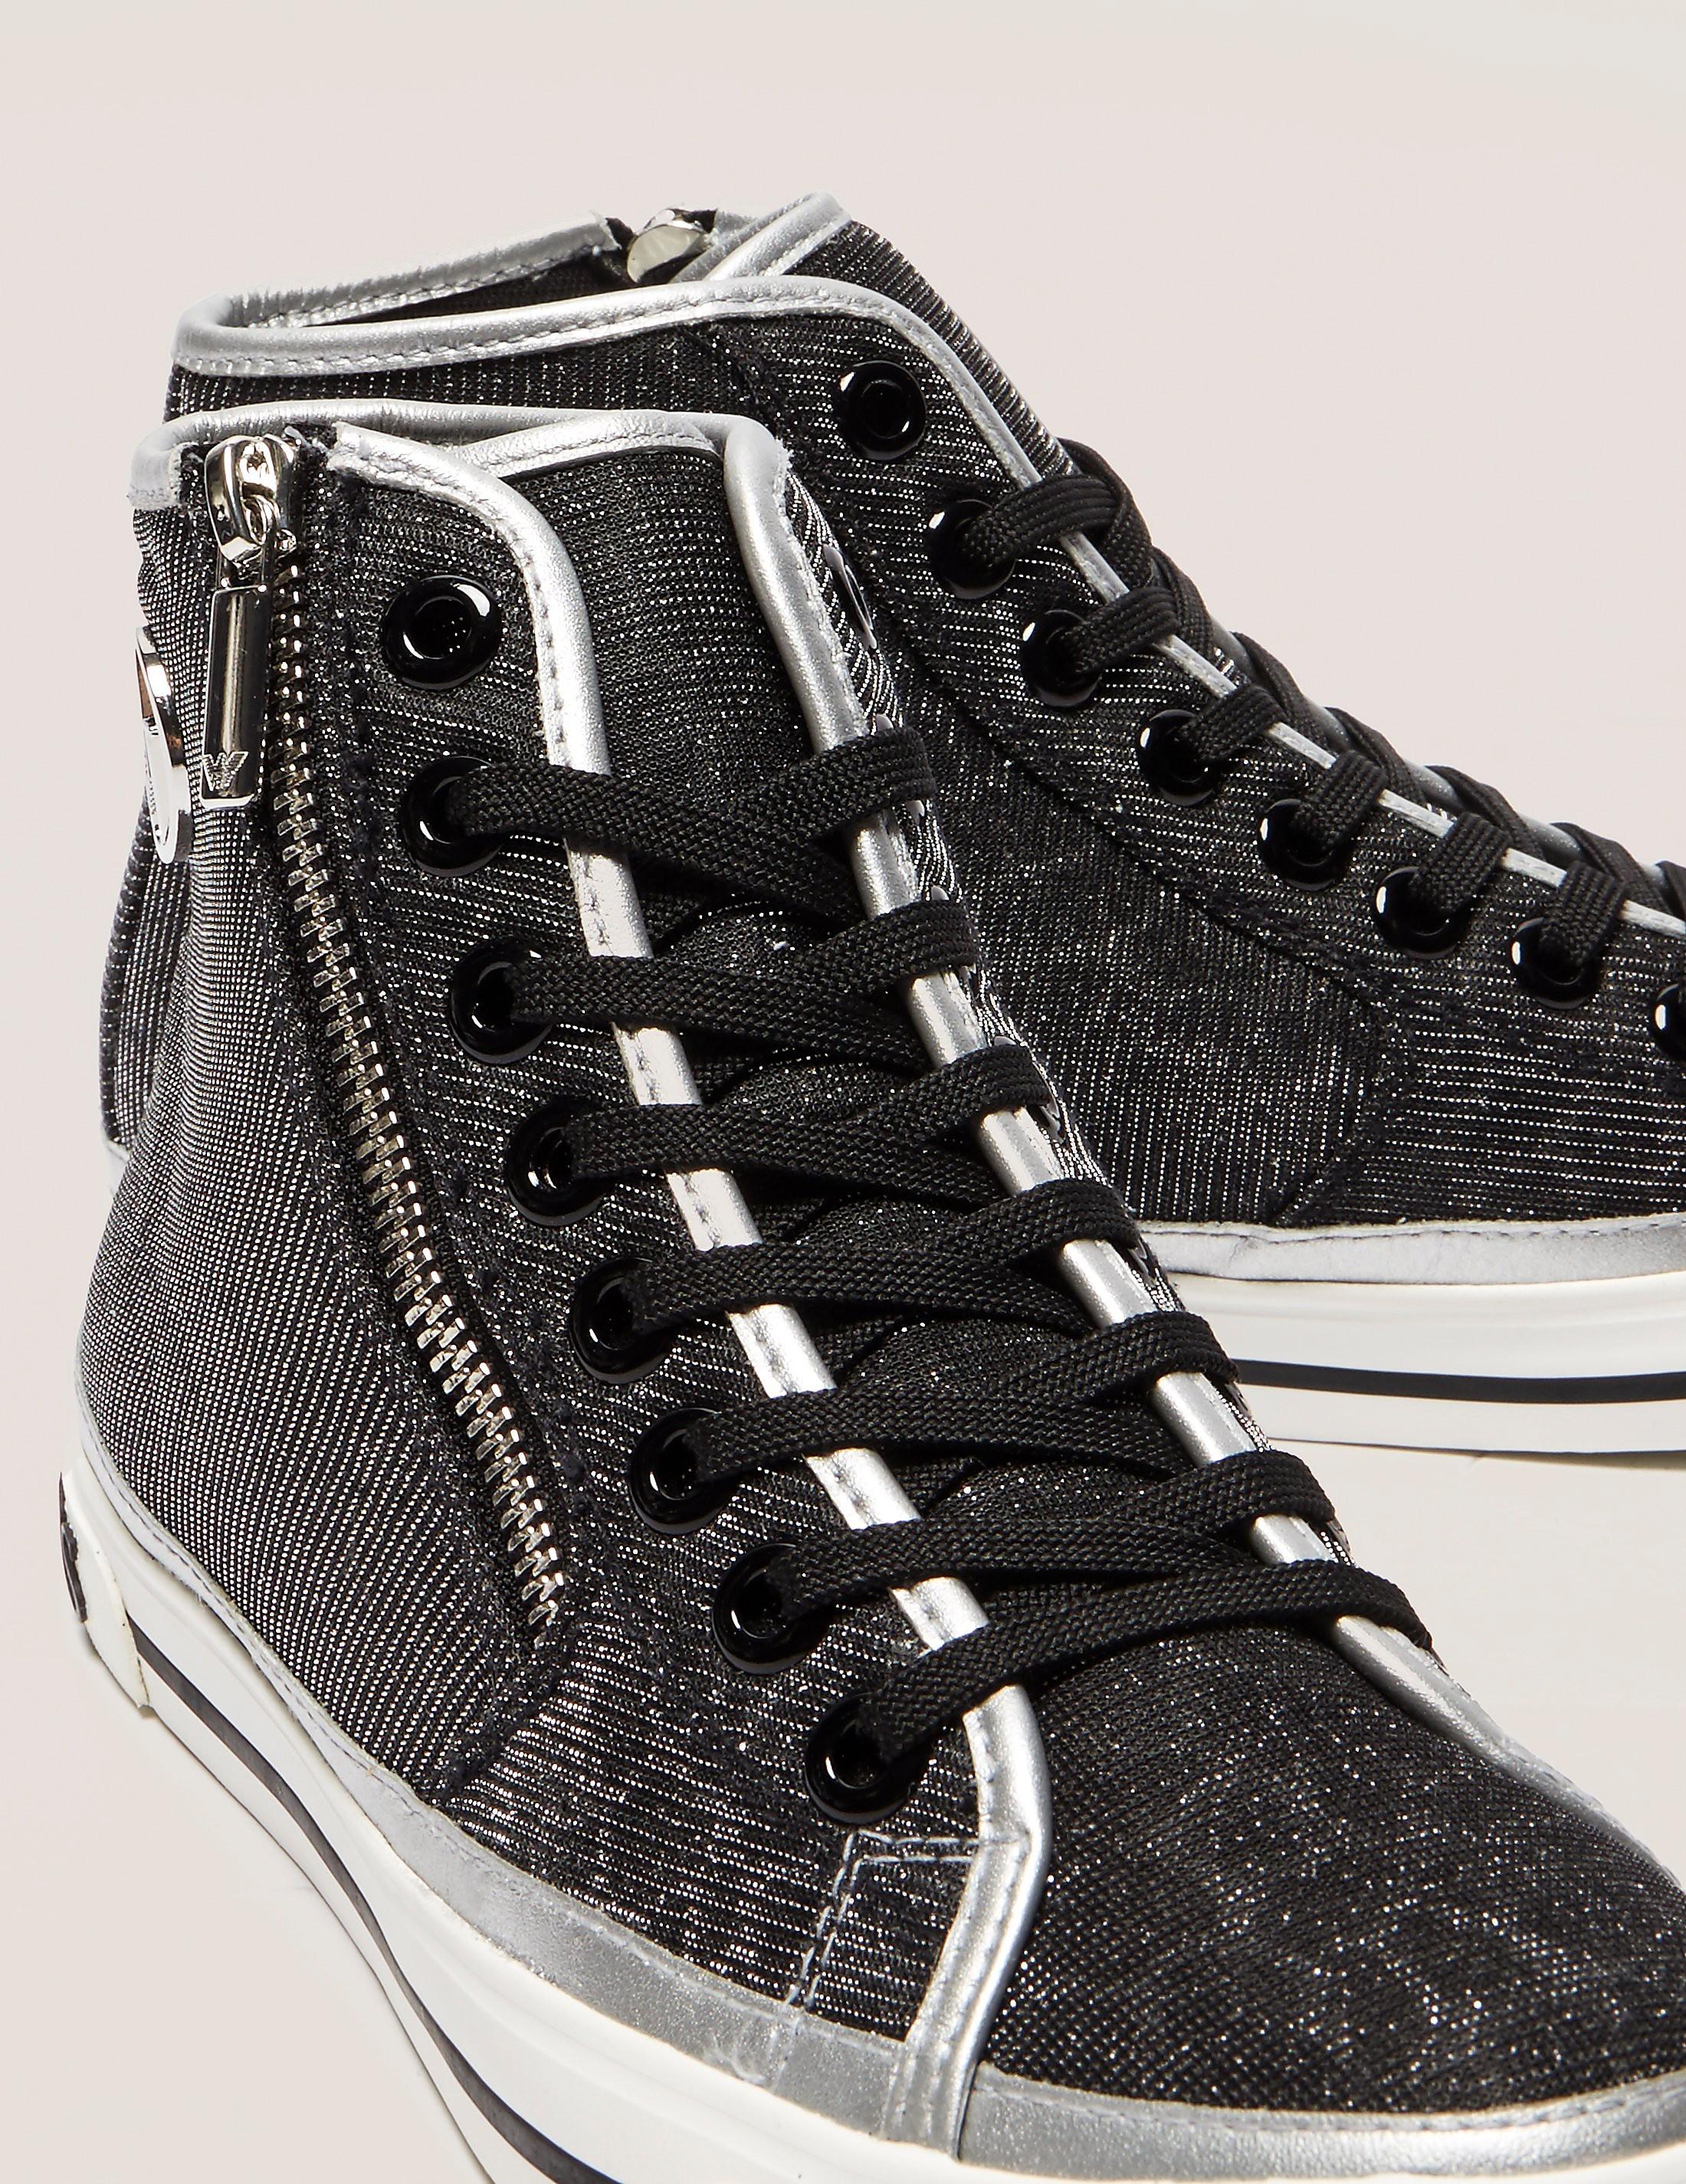 Armani Jeans Glitter High Tops